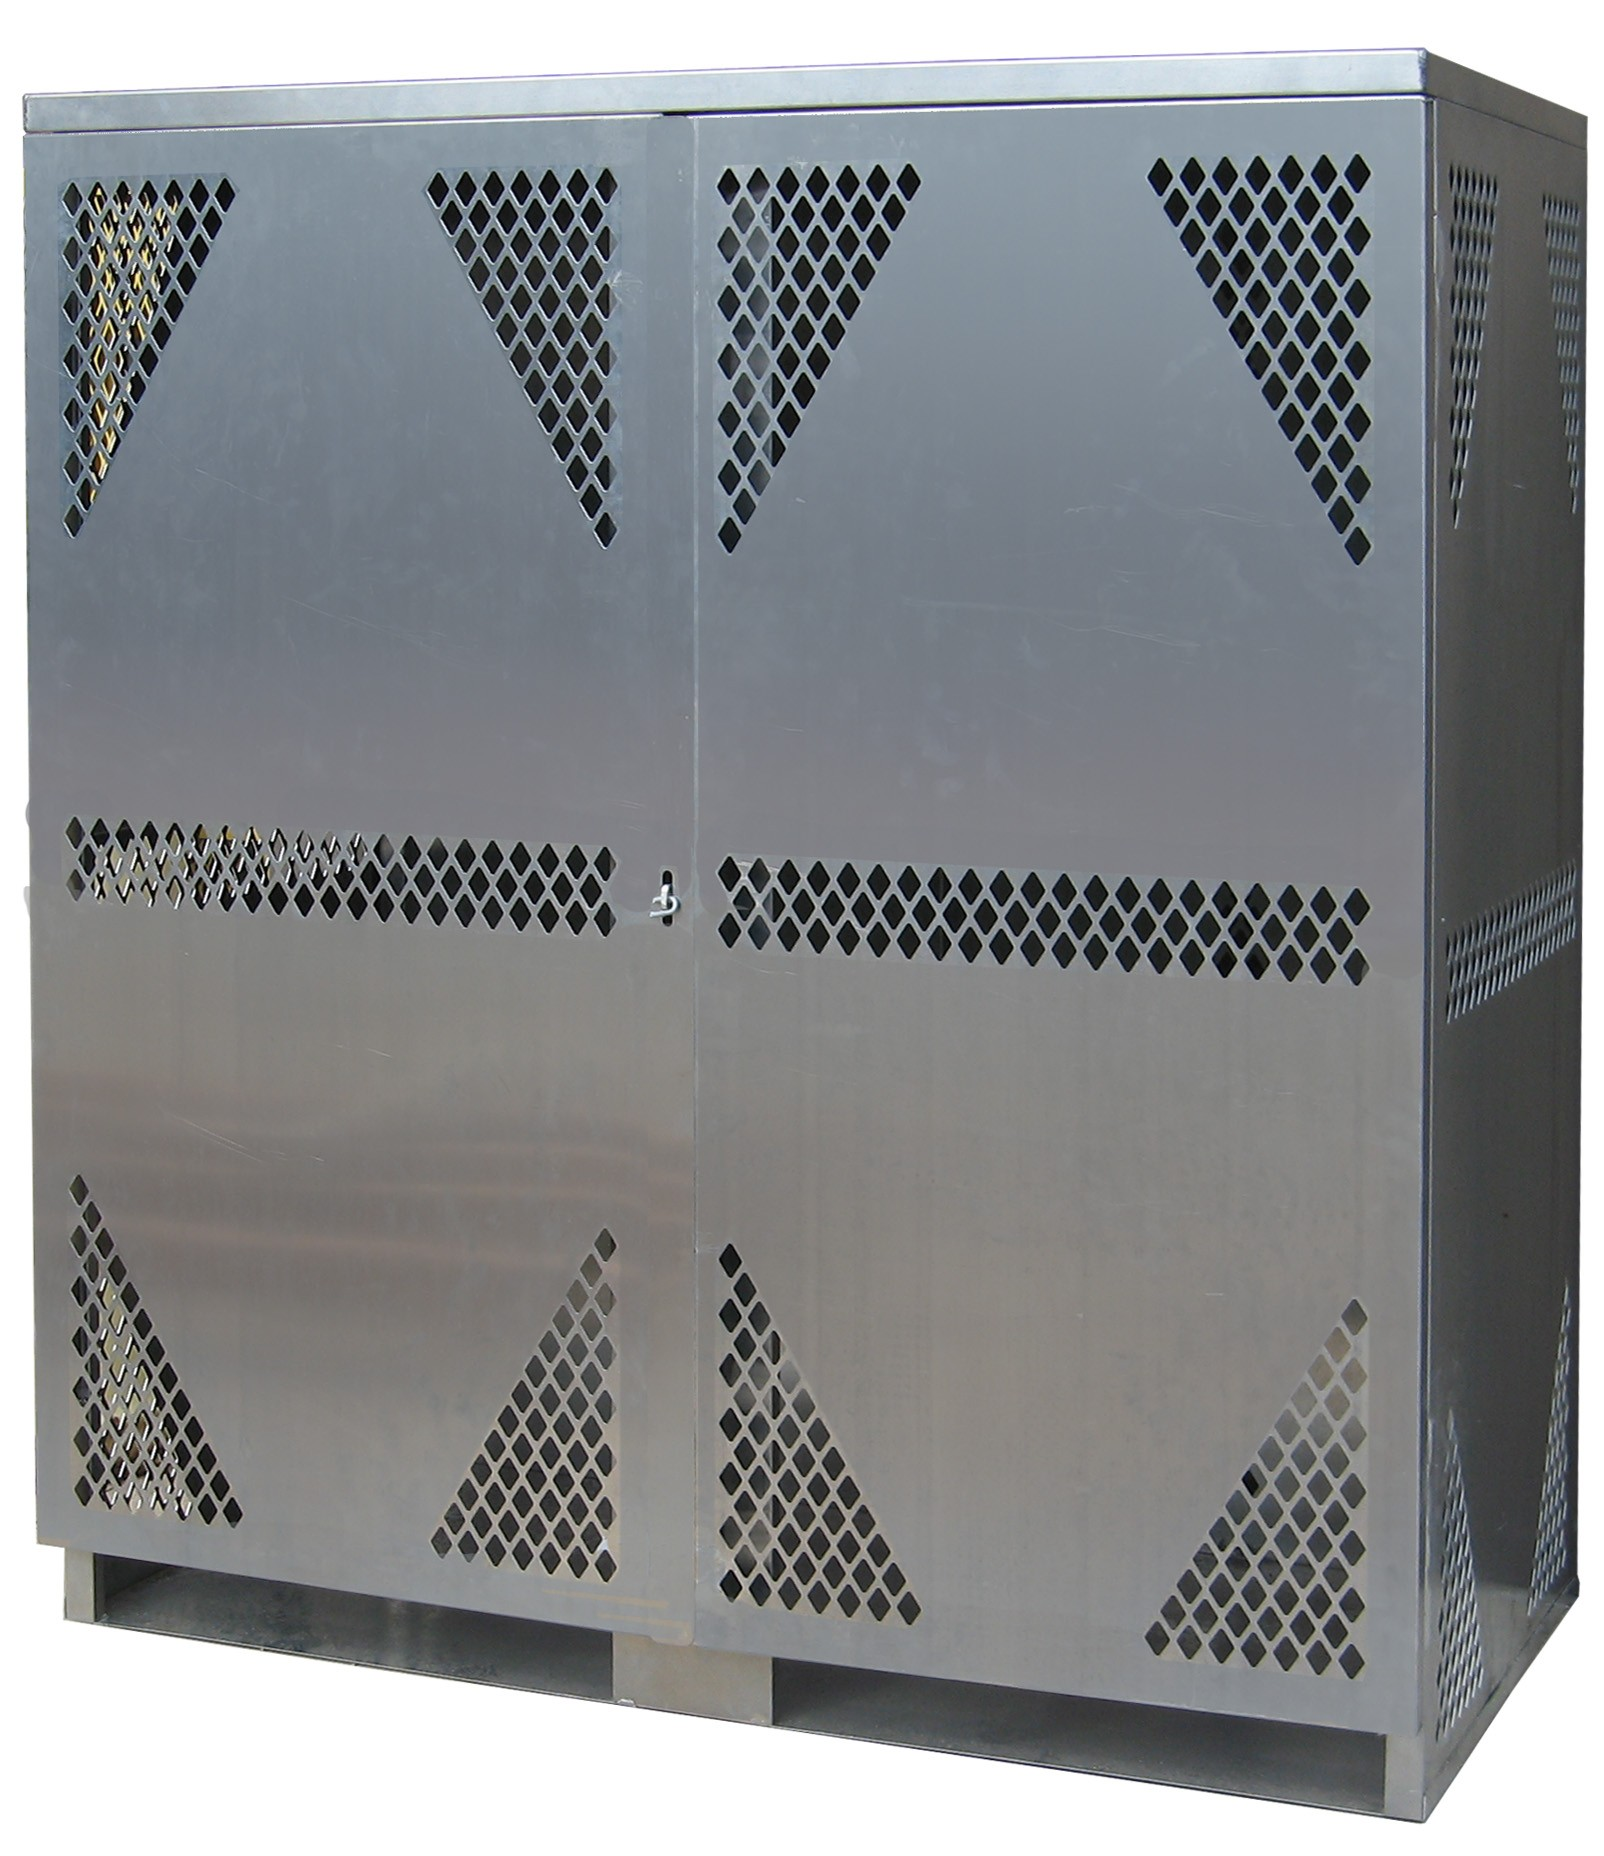 LP16 - LP/Oxygen Storage Cabinet - 16 Cyl. Horizontal Standard 2-Door